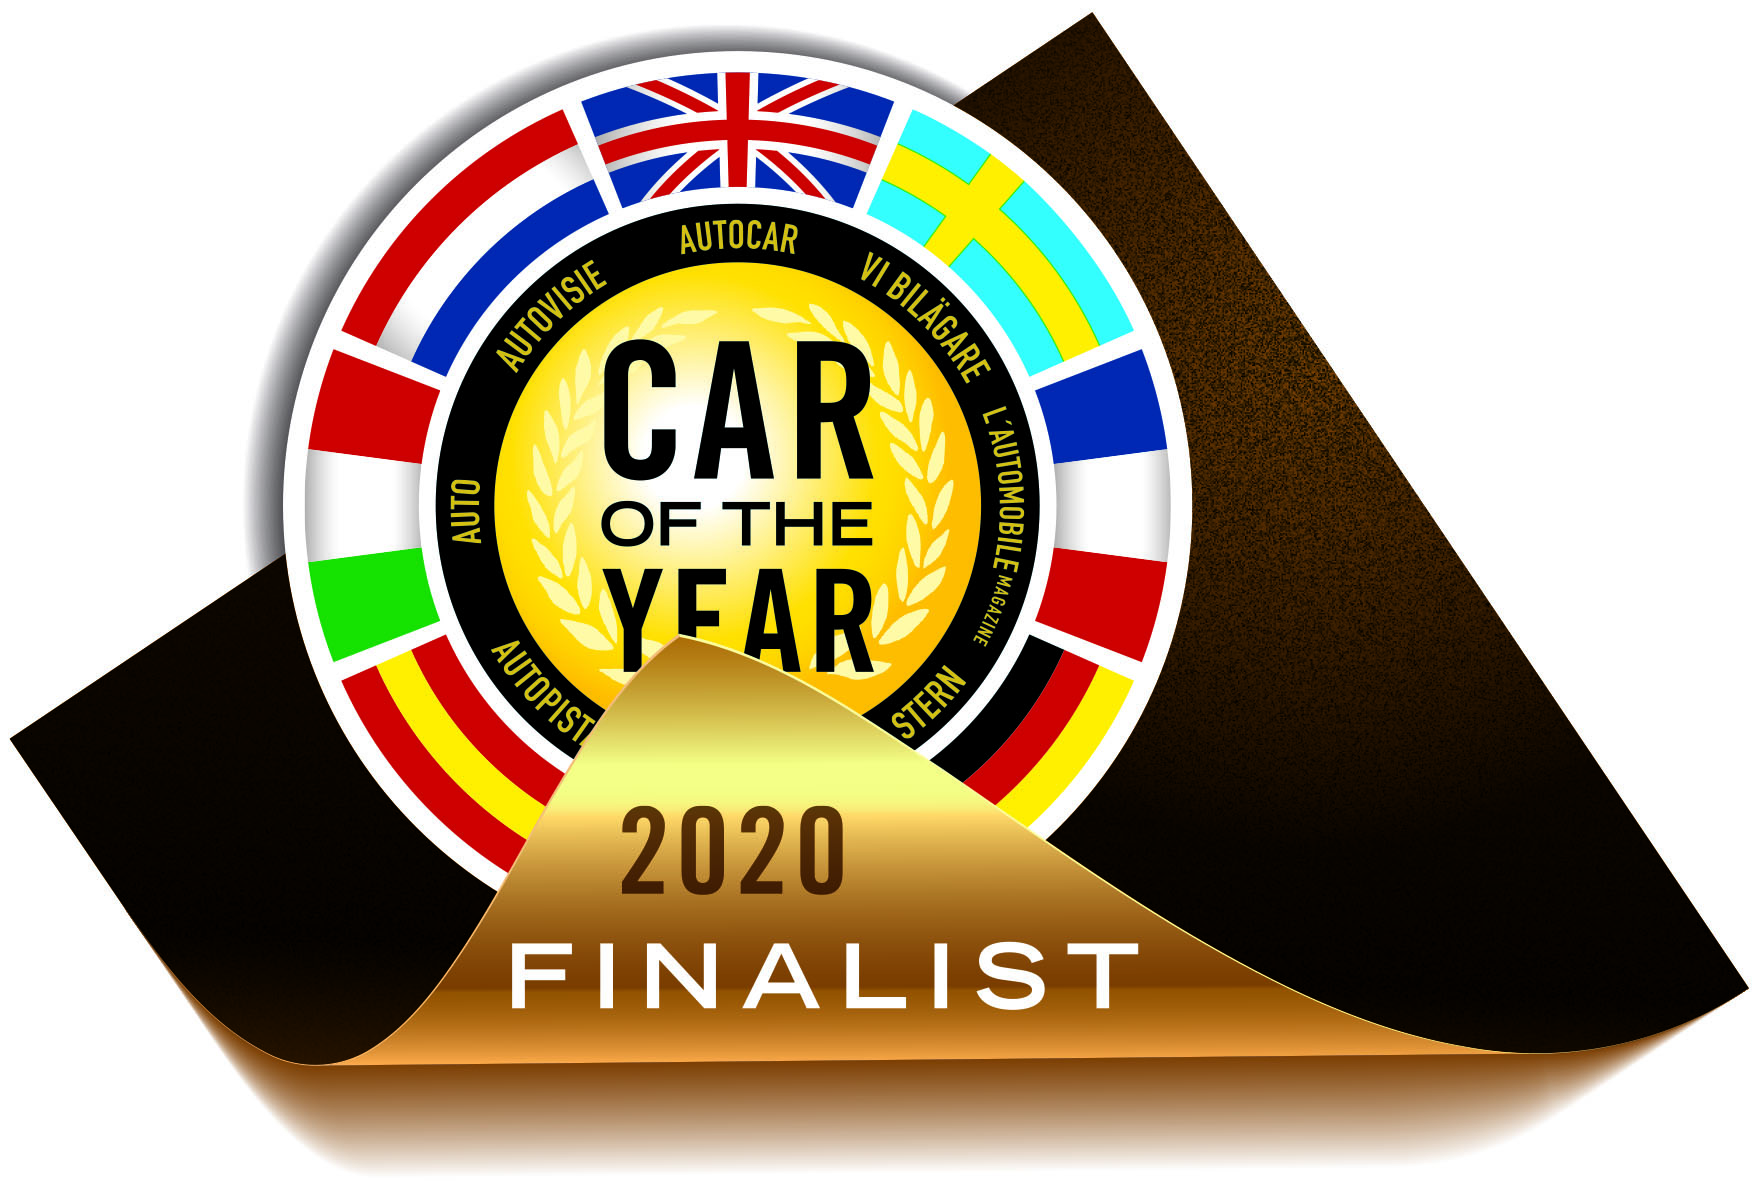 "NOUL PEUGEOT 208, FINALIST ÎN ""CAR OF THE YEAR 2020"""